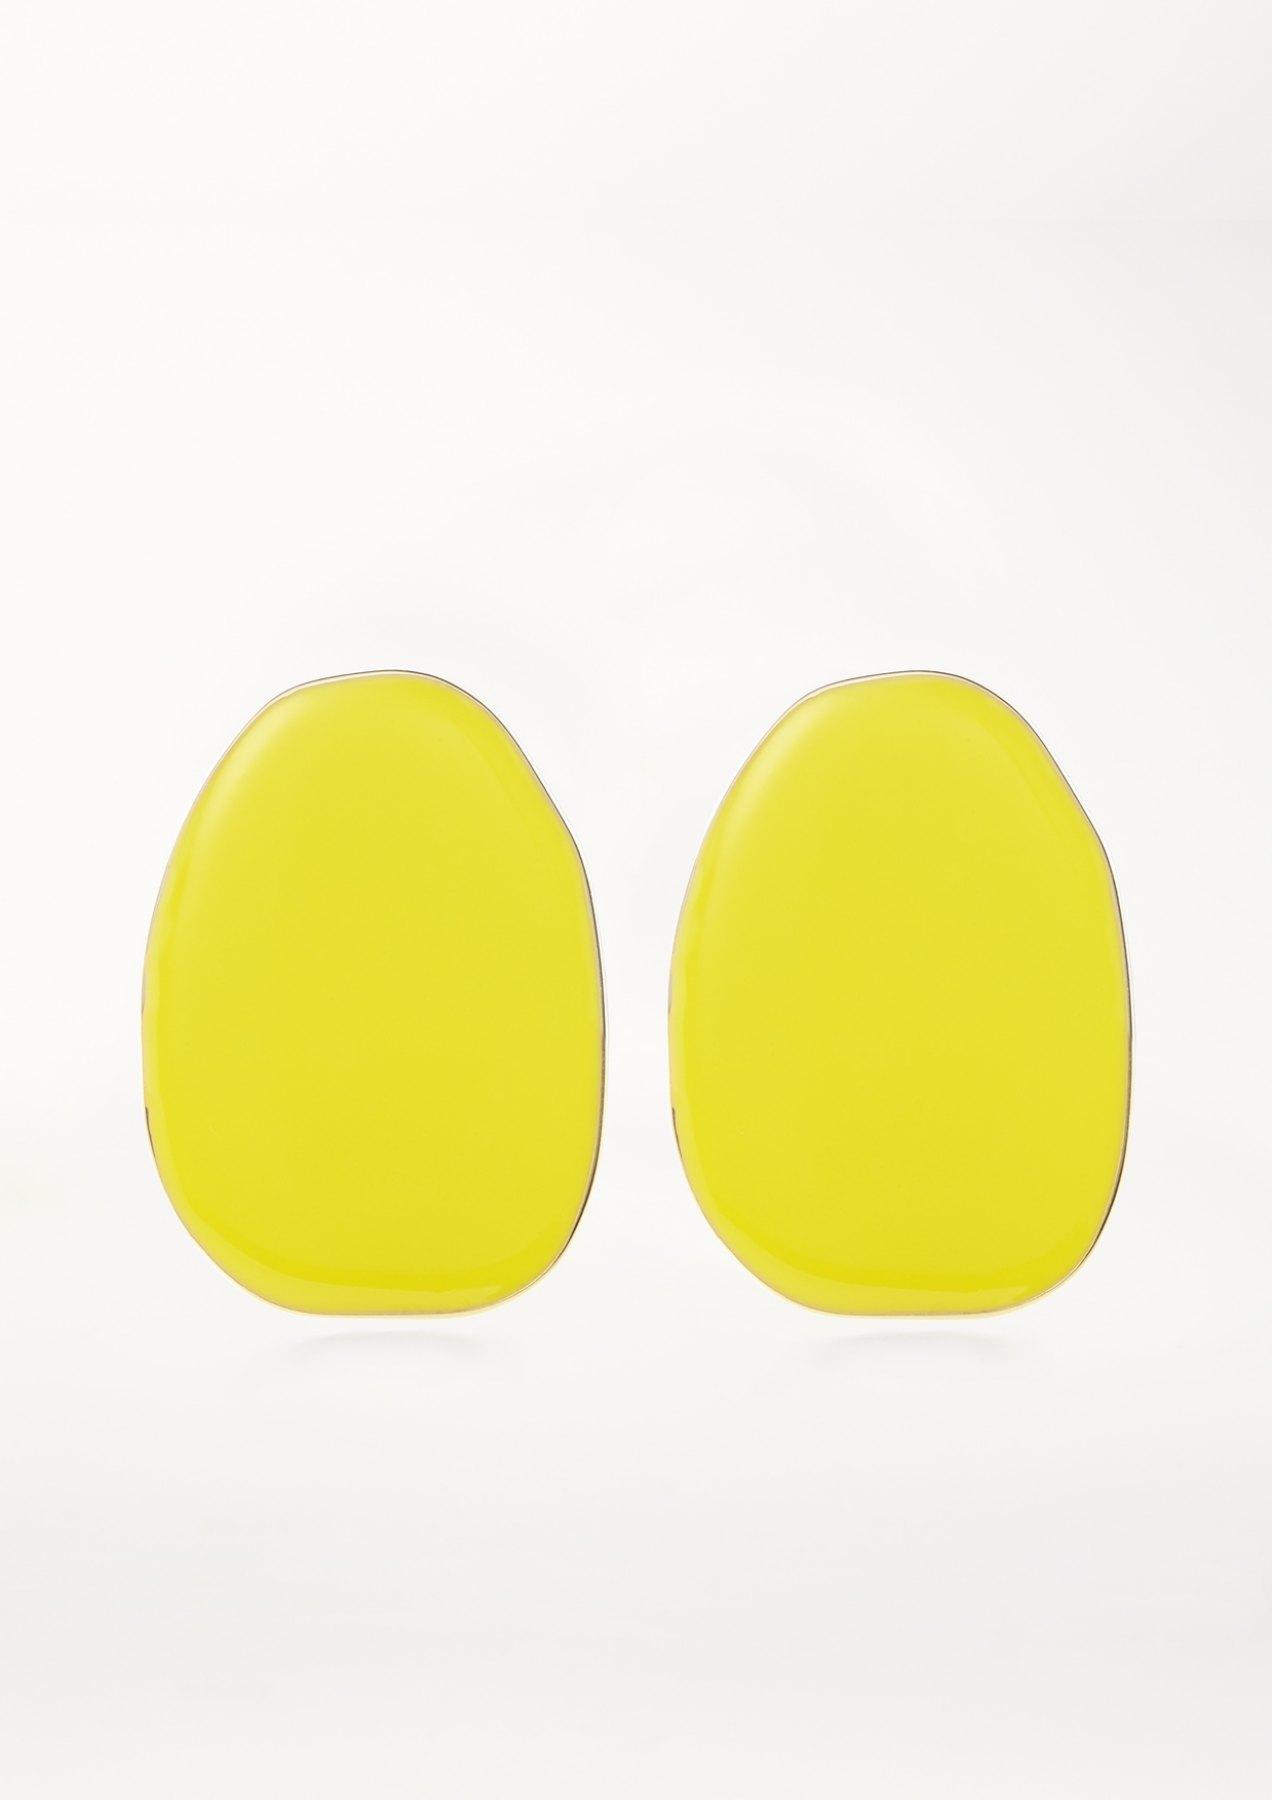 xenia bous jewellery coloured stone 01 earrings knallgelb yellow